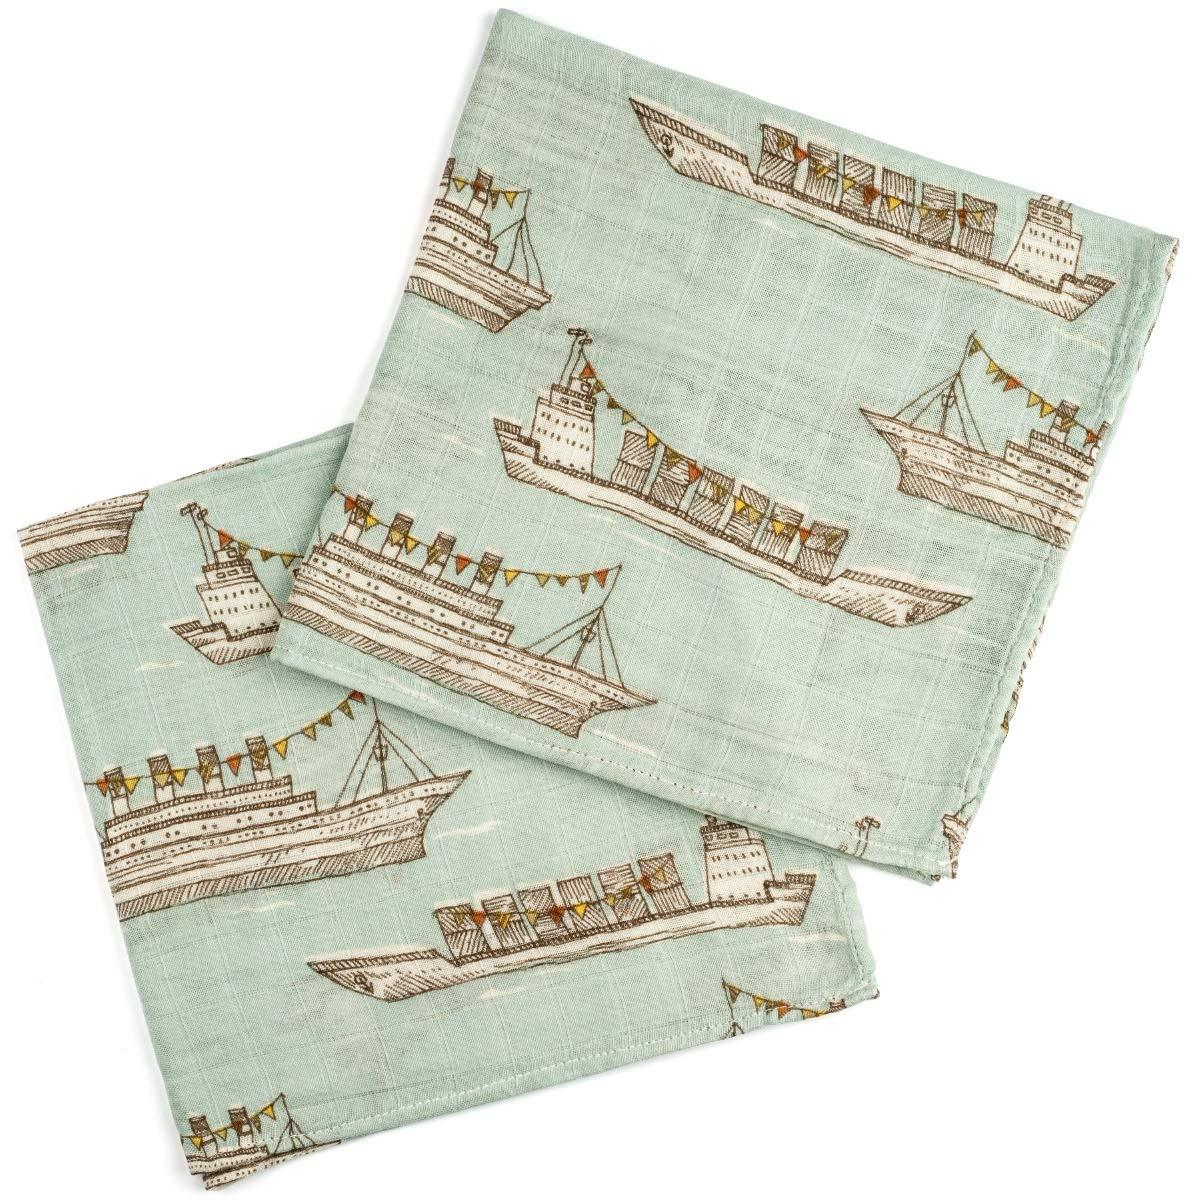 MilkBarn Bamboo Cotton Burp Cloths Blue Ships - Set of 2